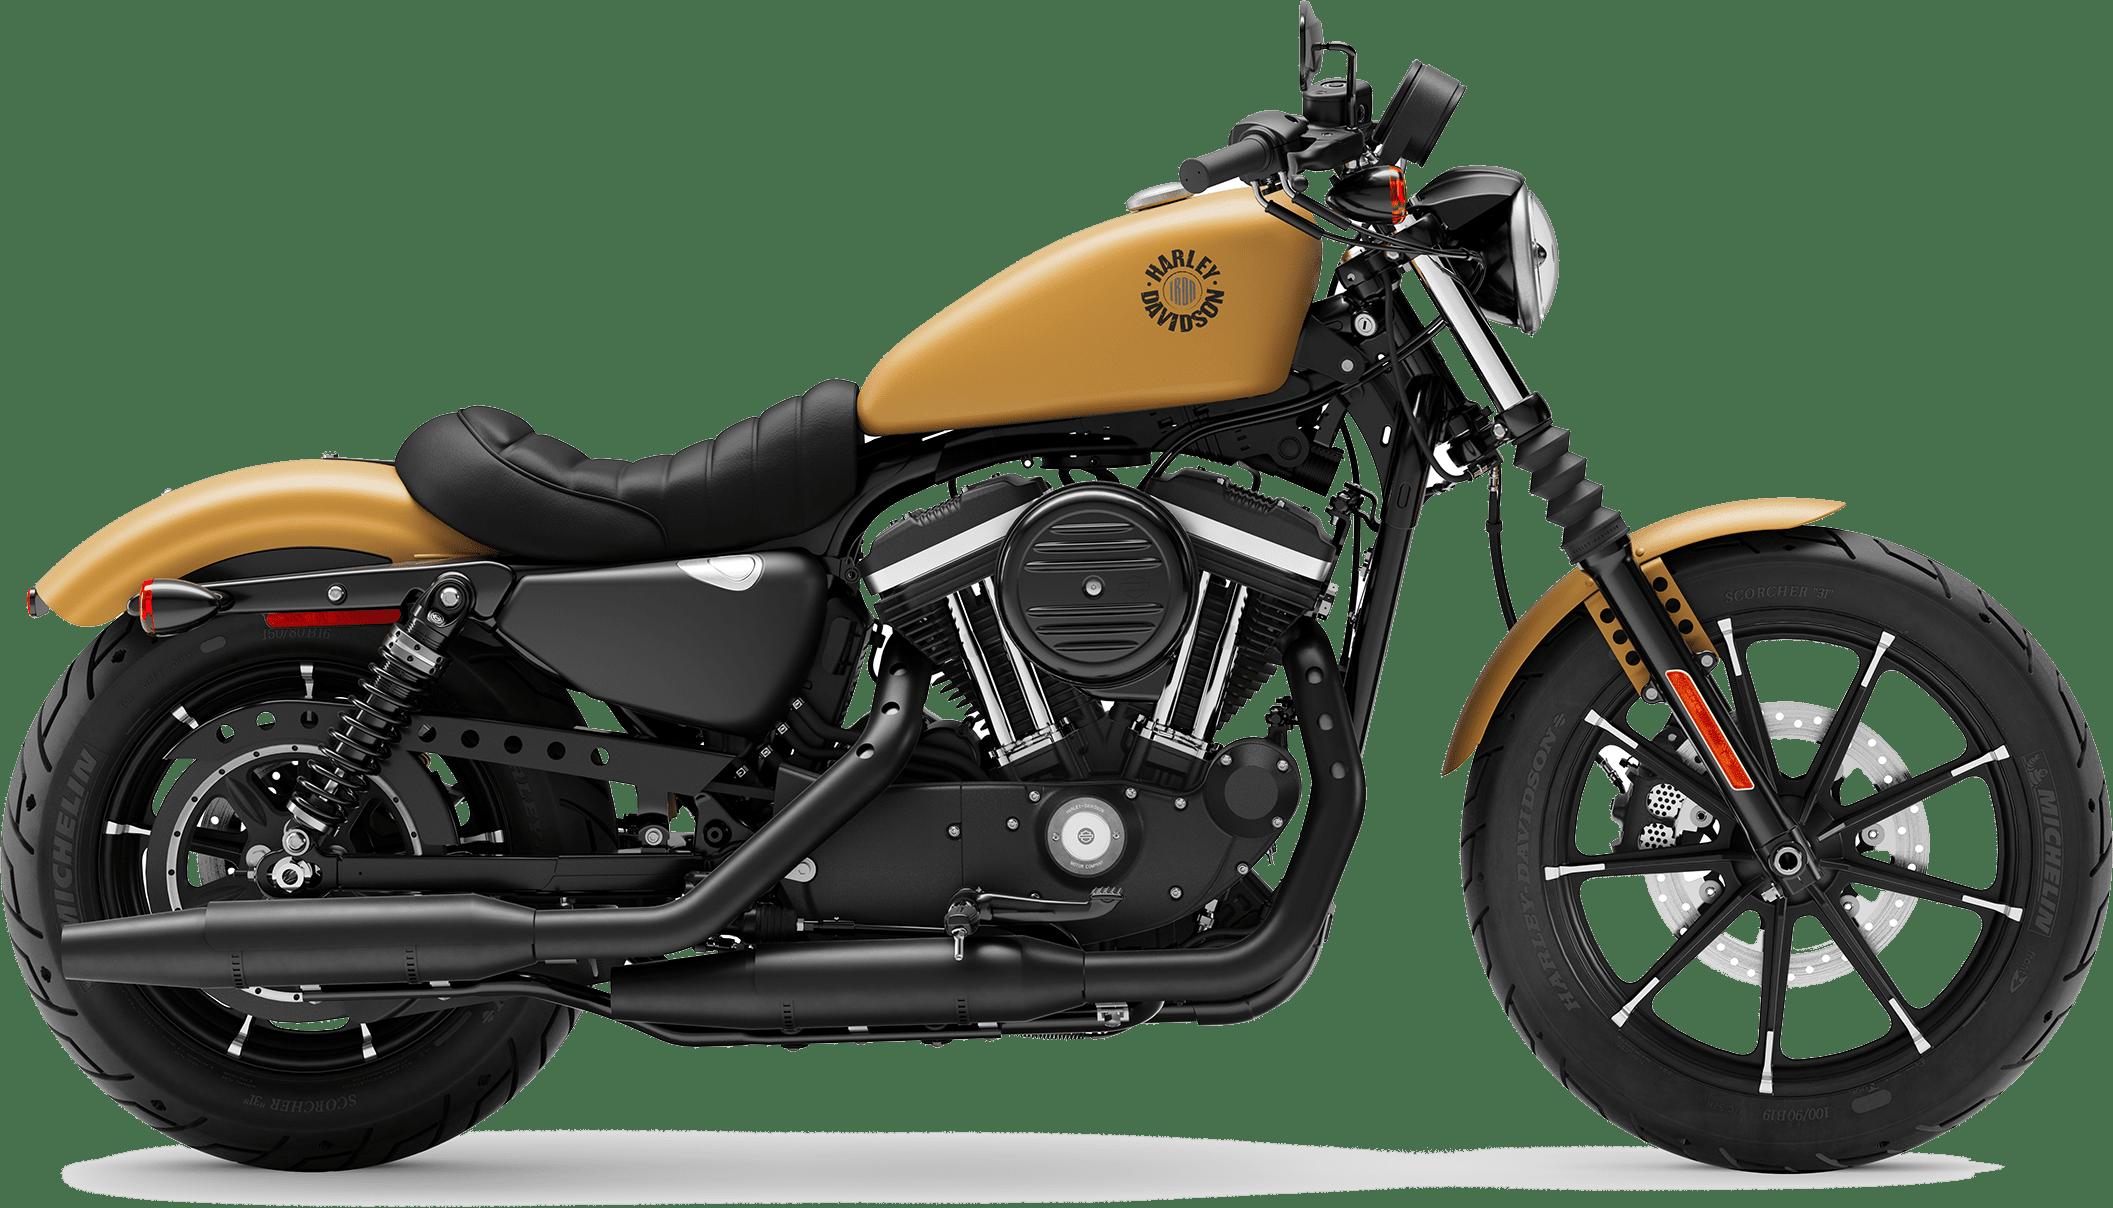 2019 Harley-Davidson H-D Sportster Iron 883 Rugged Gold Denim